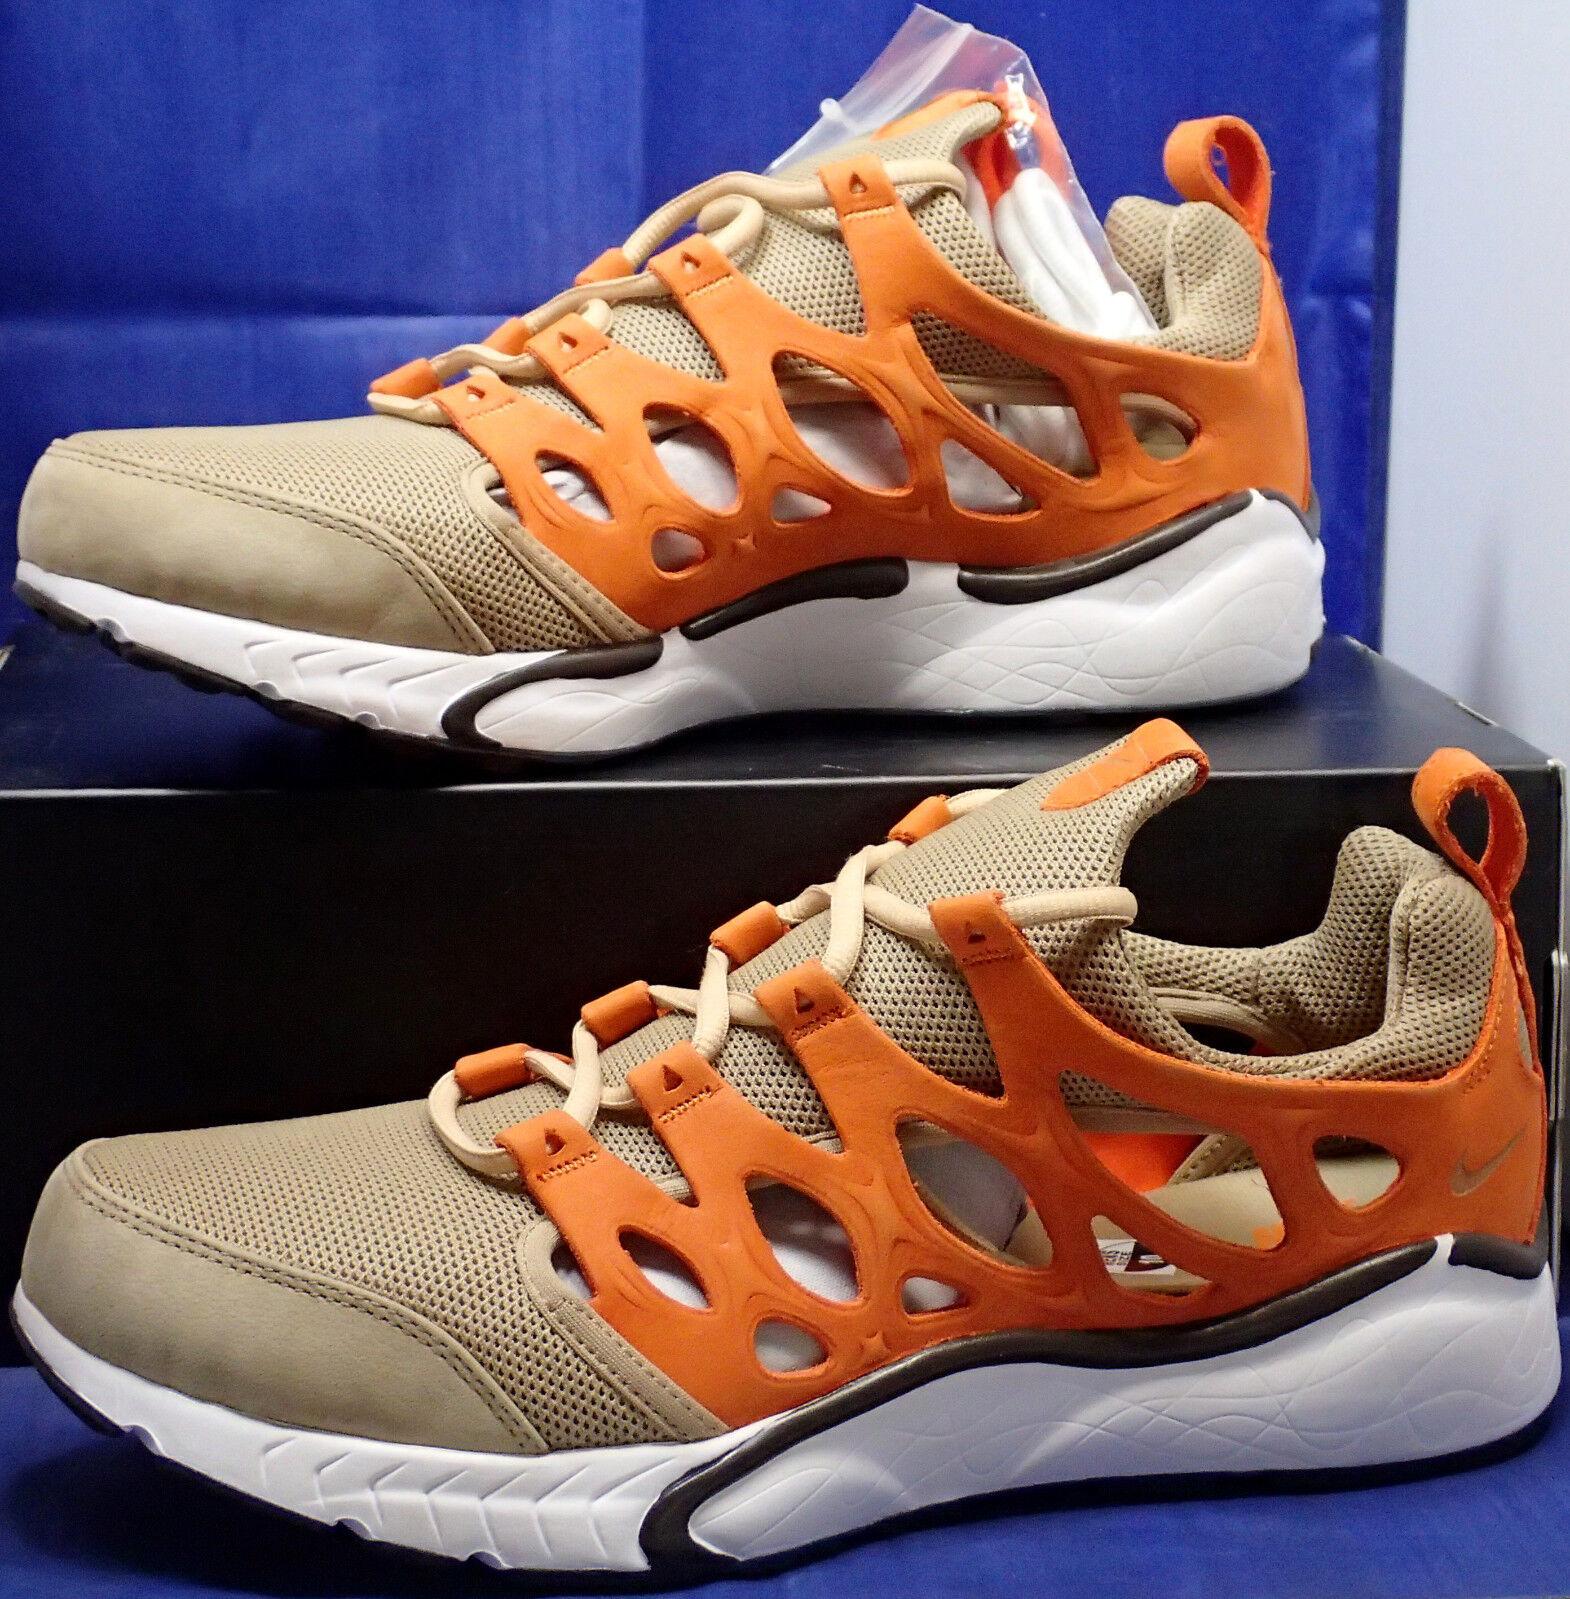 Nike Air Zoom Chalapuka Vachetta Tan Orange White Presto SZ 10 ( 872634-202 ) Scarpe classiche da uomo